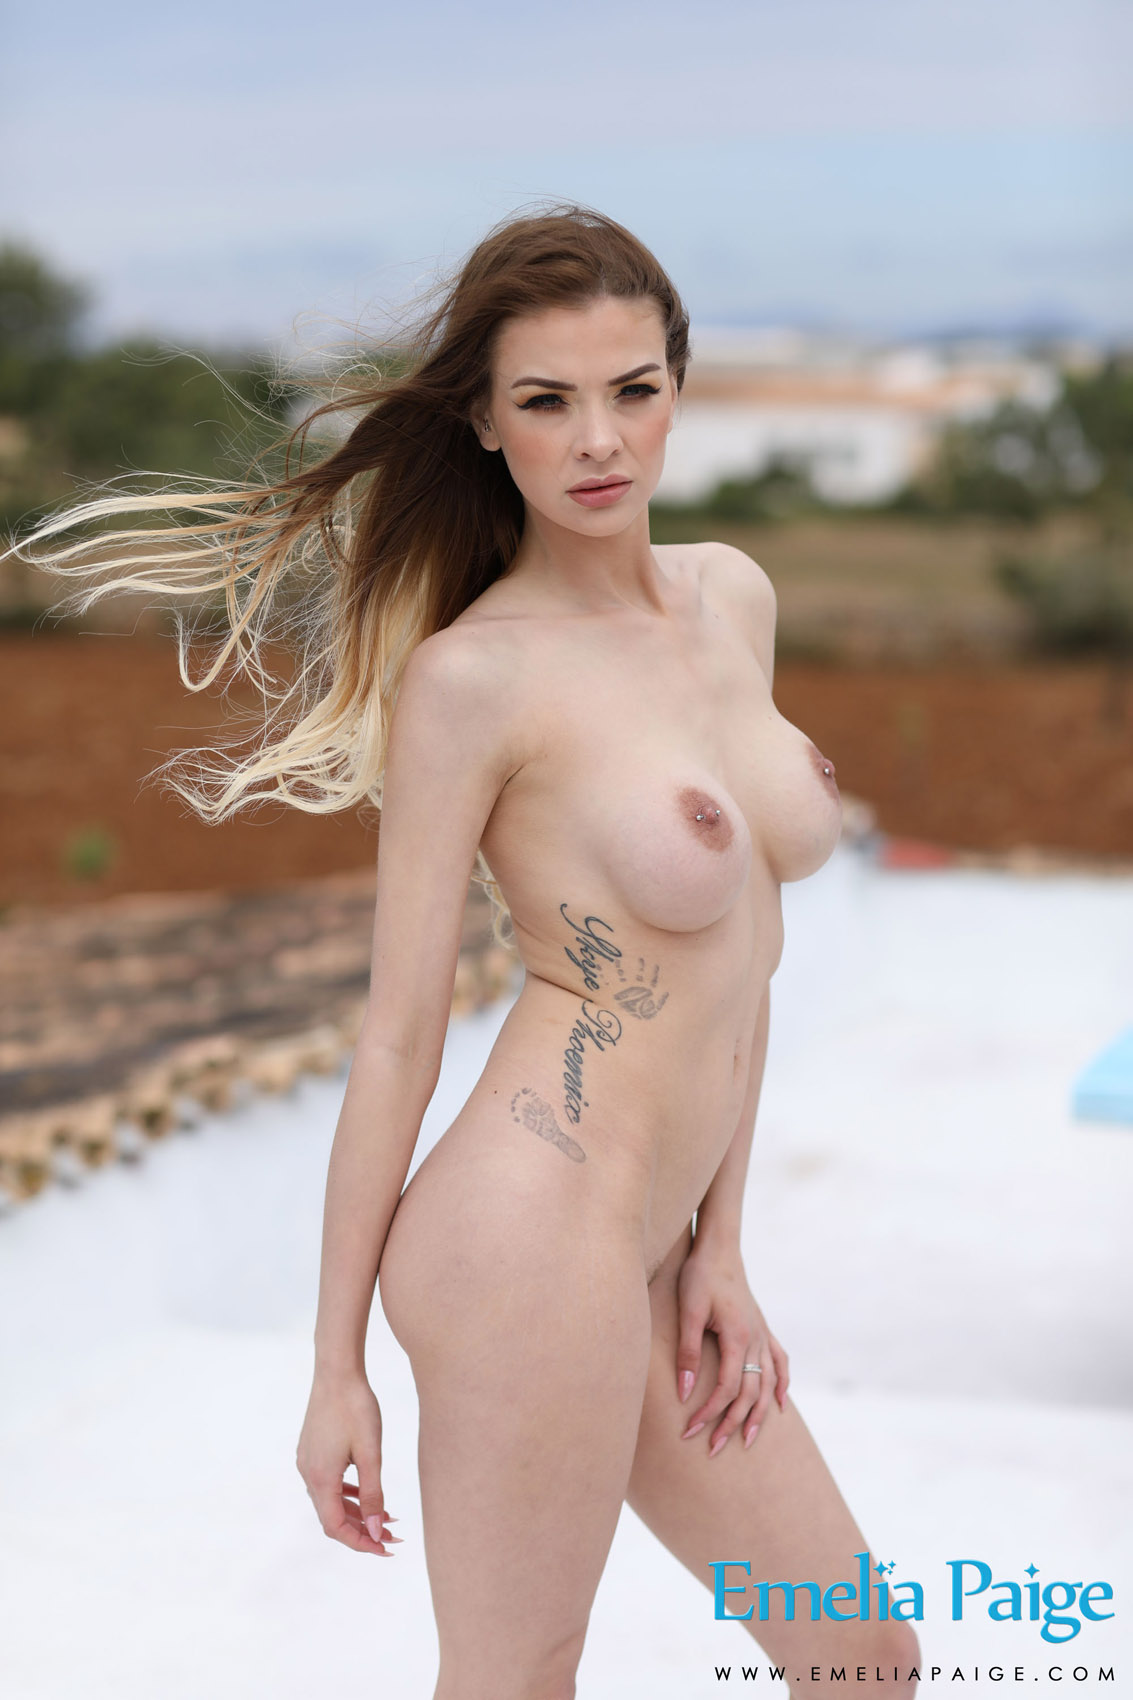 Paige garland nude